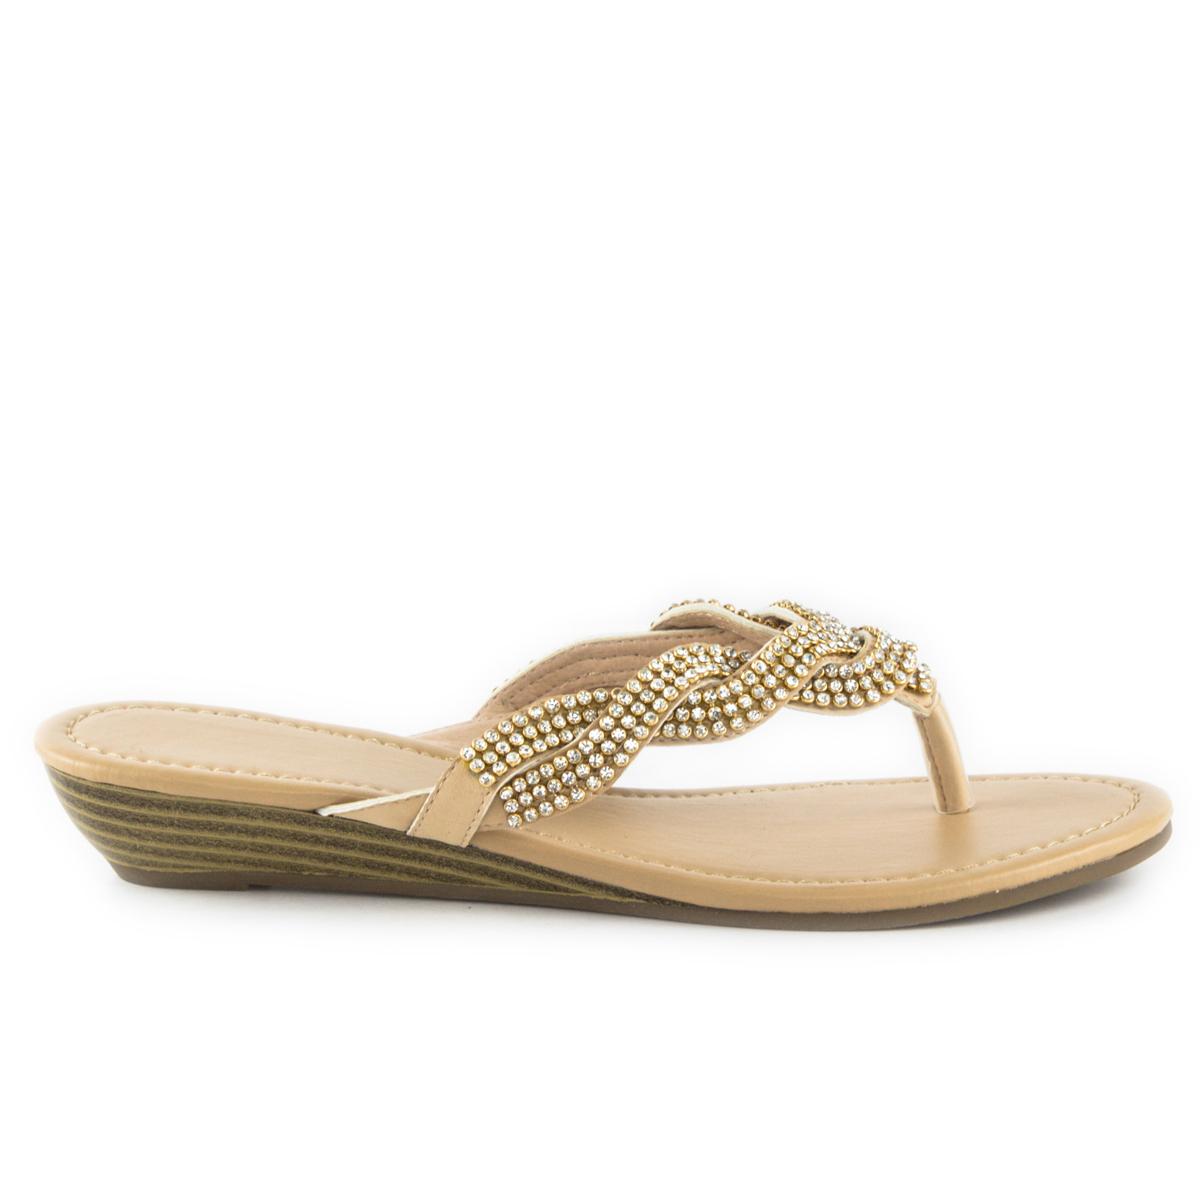 Shoe zone lilley womens nude diamante toe post sandal 12 99